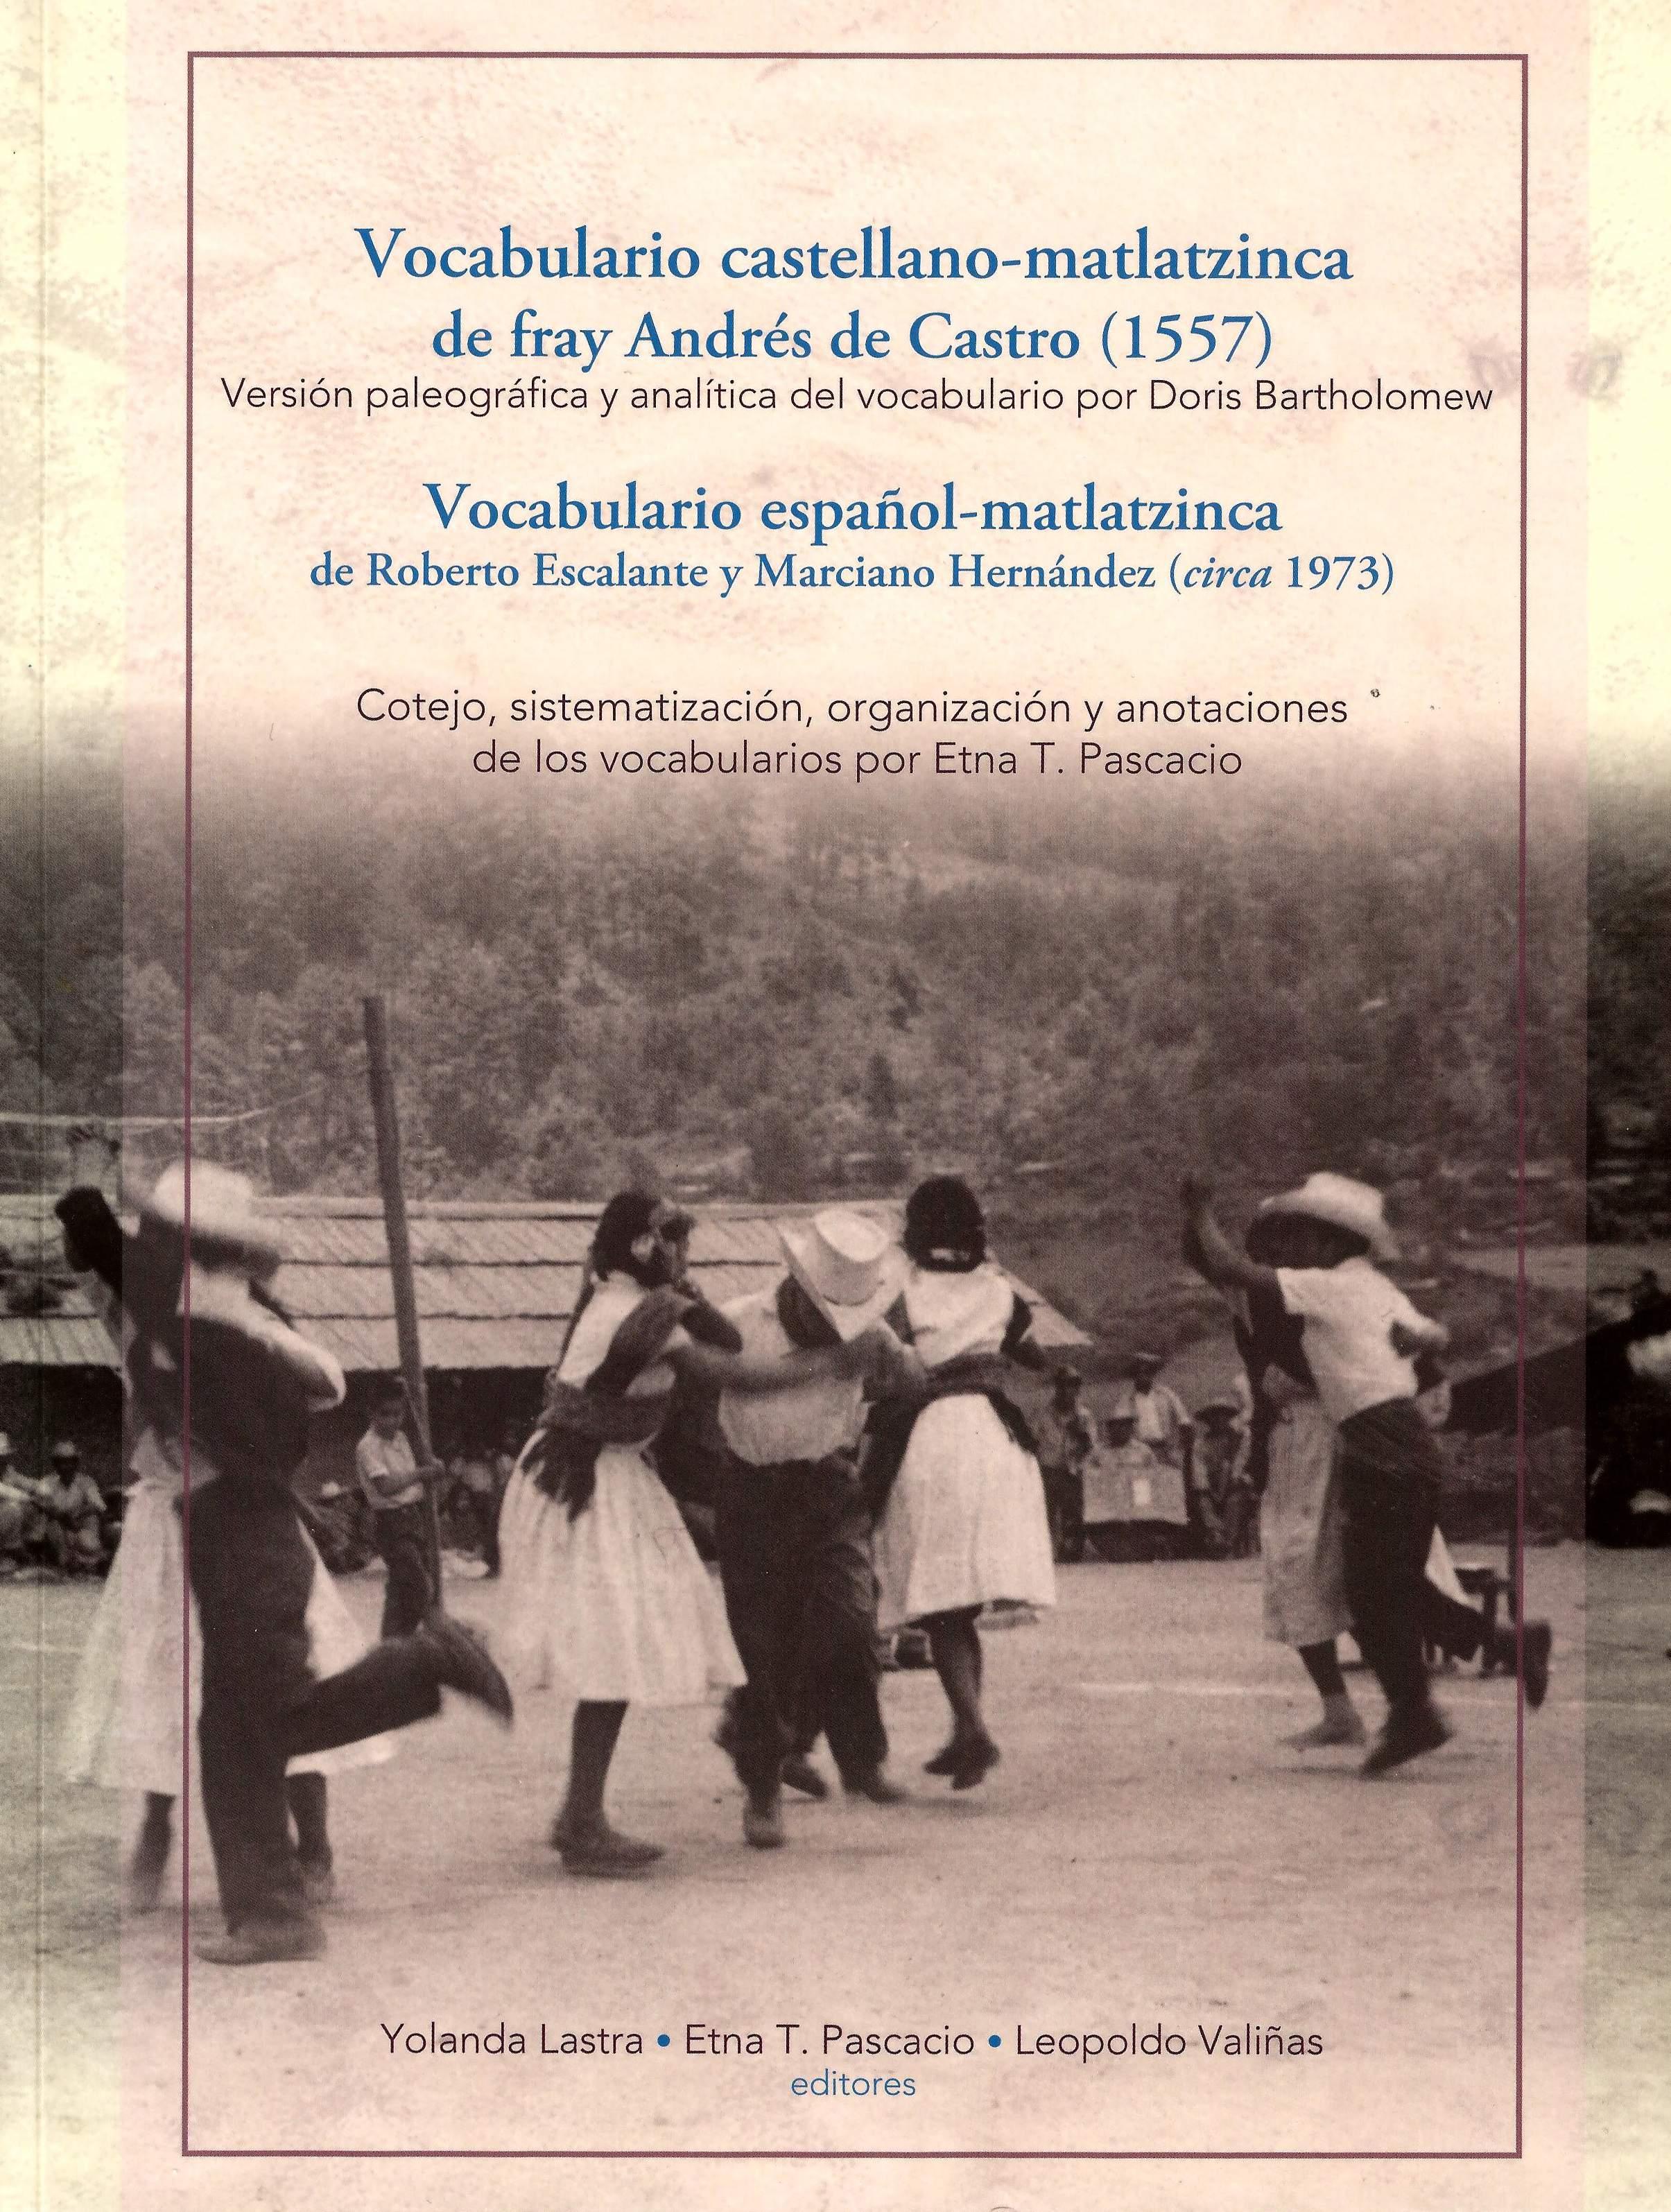 Vocabulario castellano-matlatzinca de fray Andrés de Castro (1557) y vocabulario español-matlatzinca